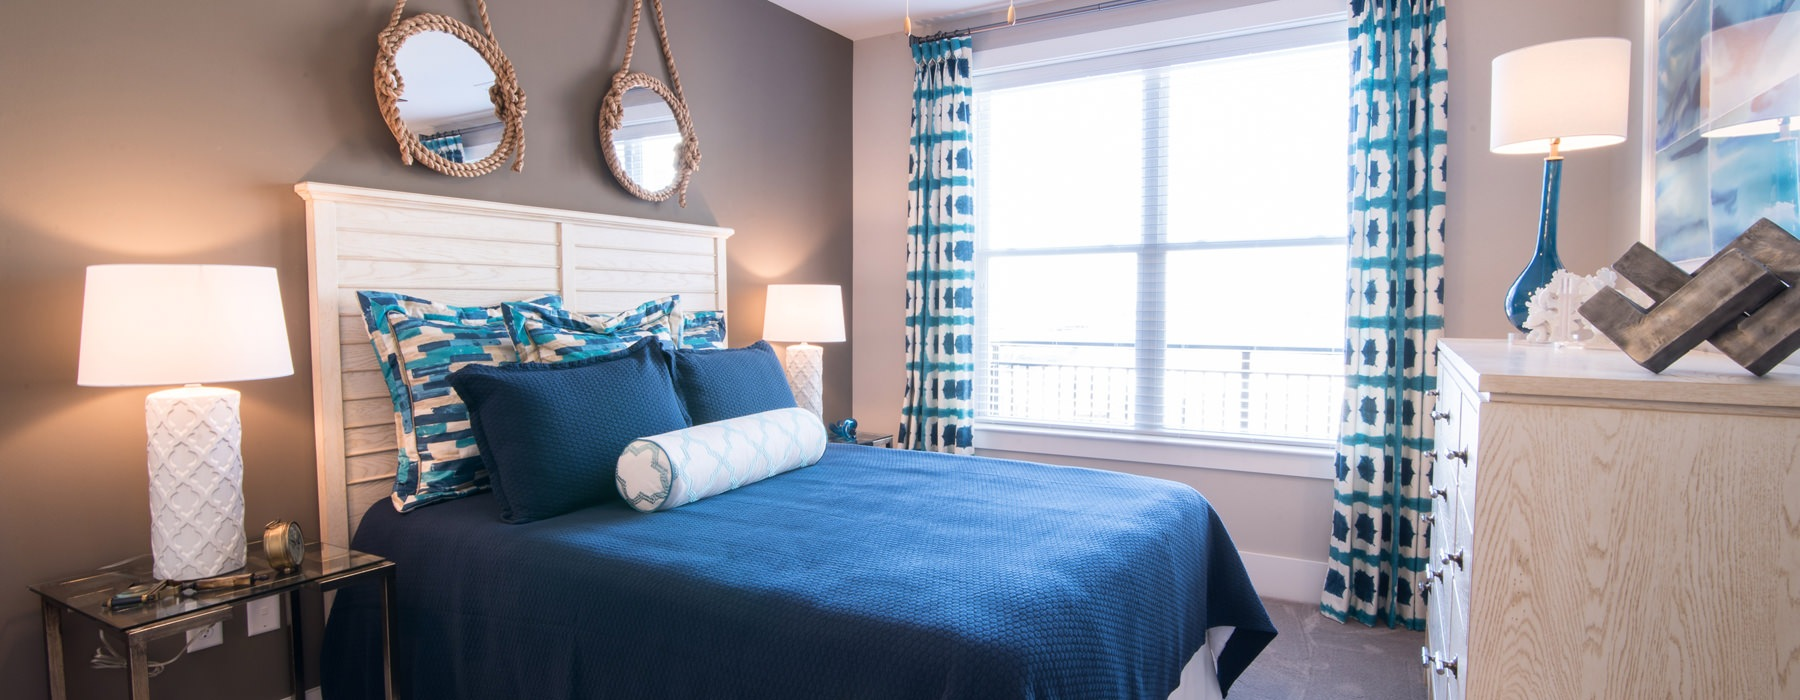 Coastal, cozy bedroom with large window